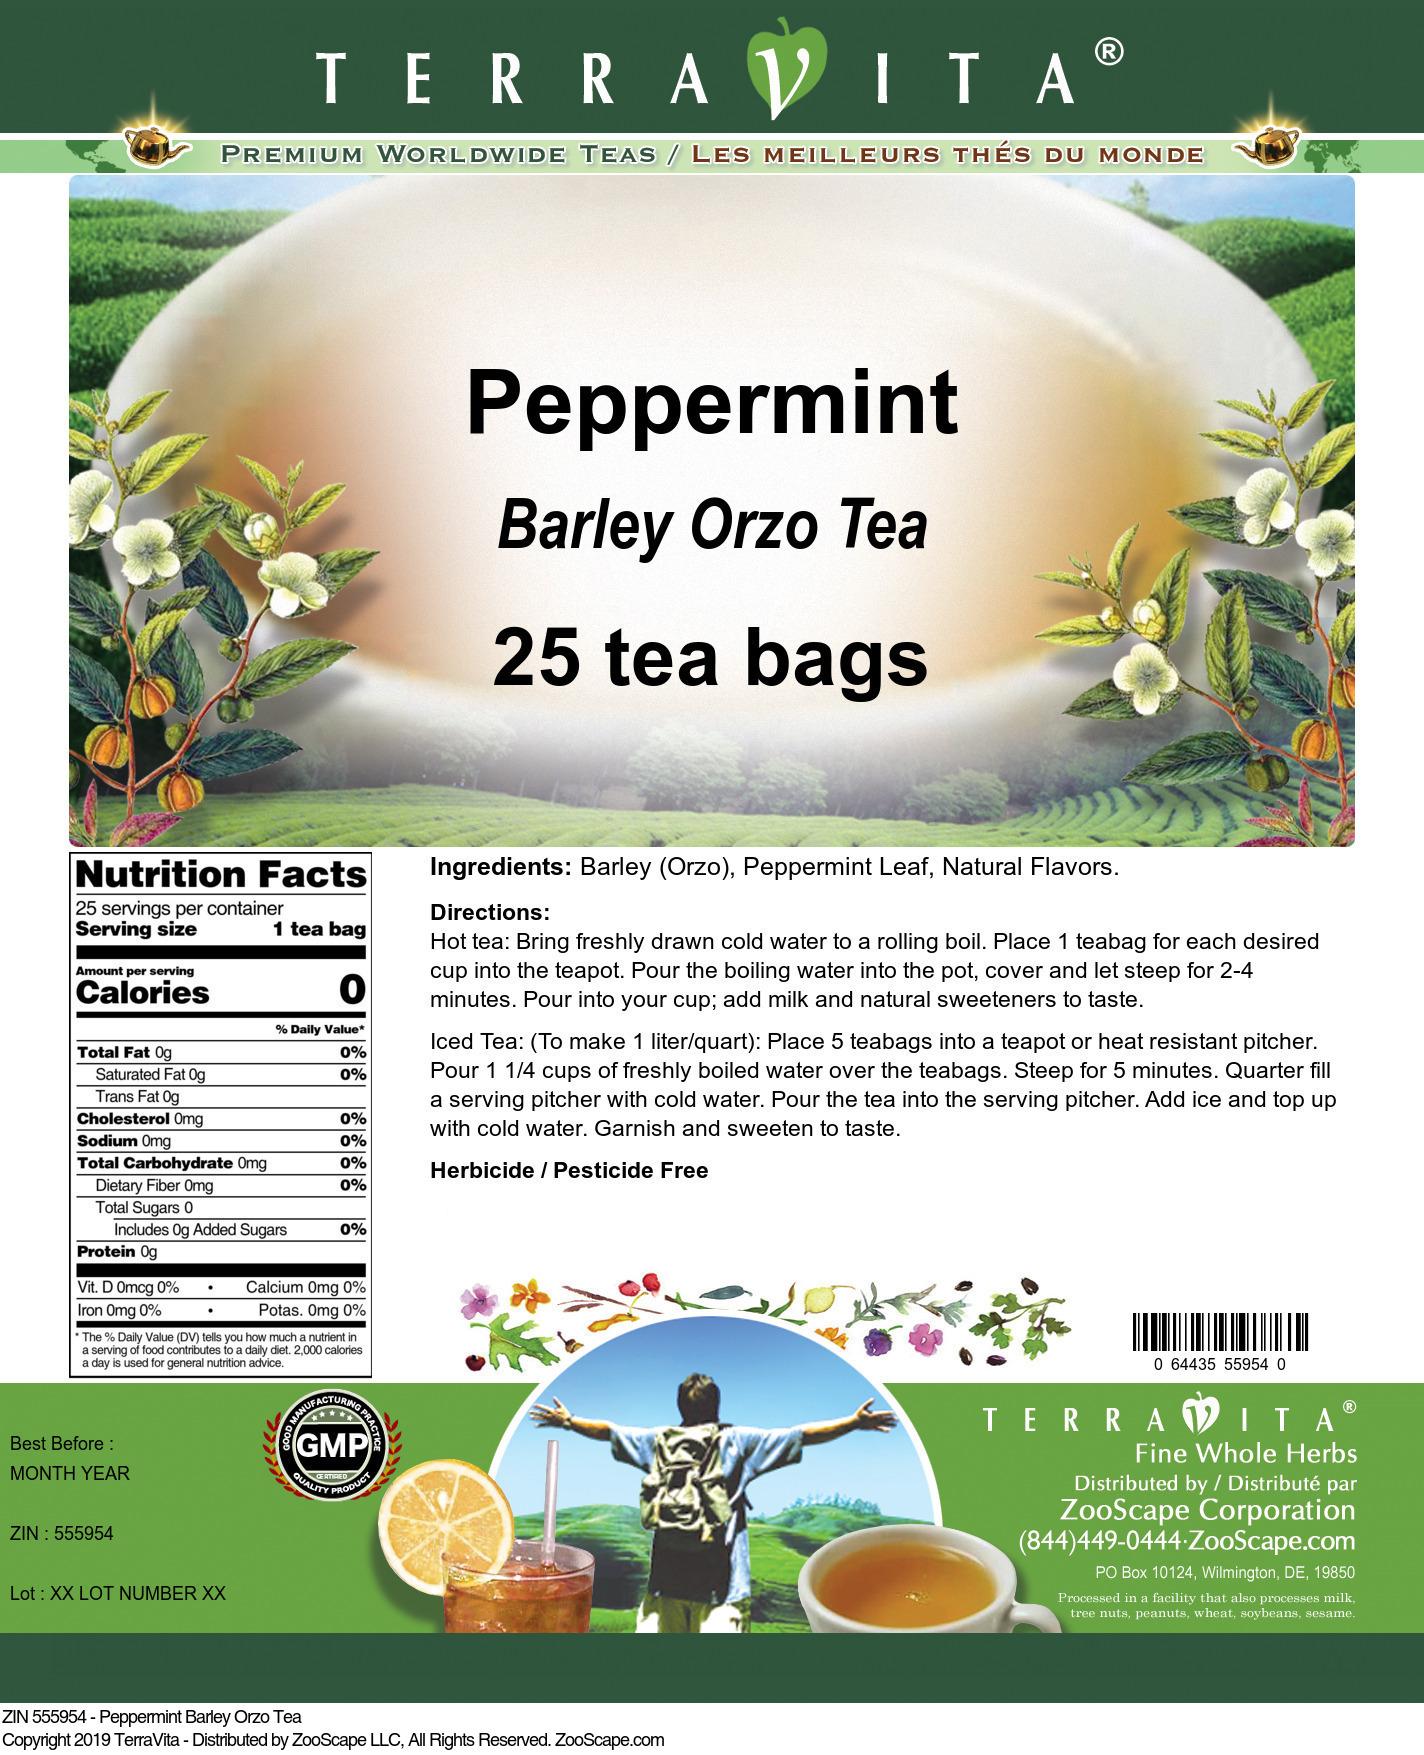 Peppermint Barley Orzo